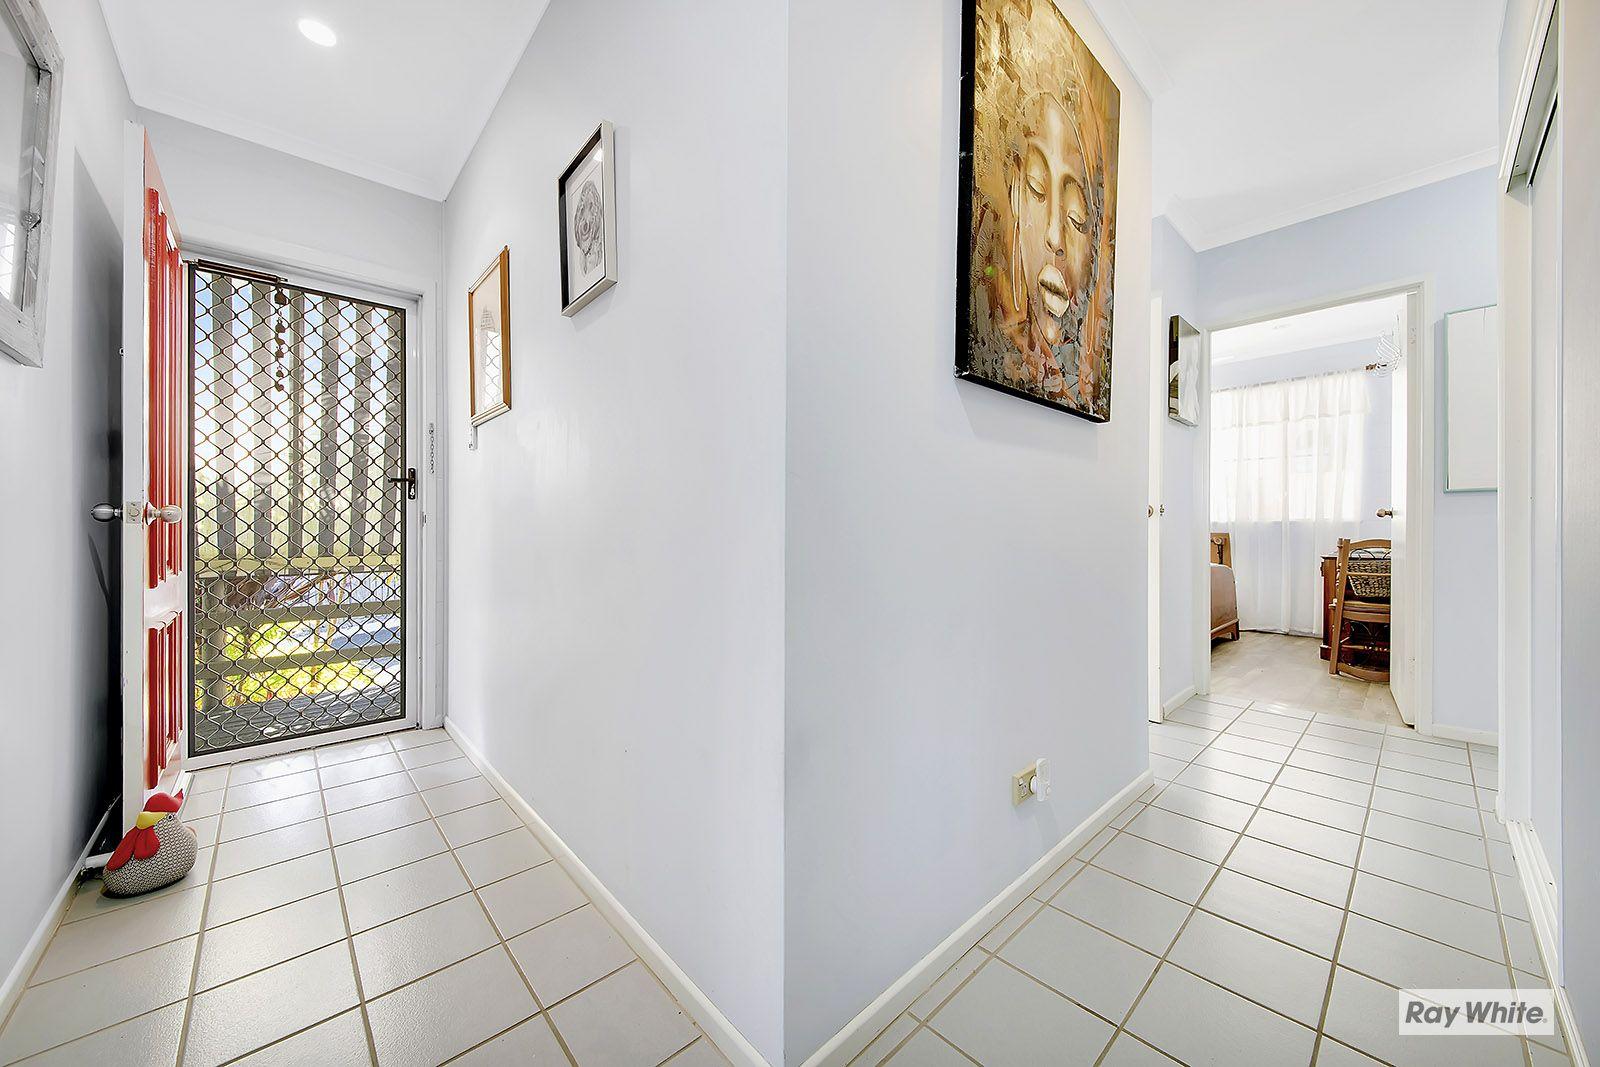 2/48 Rockhampton Road, Yeppoon QLD 4703, Image 1